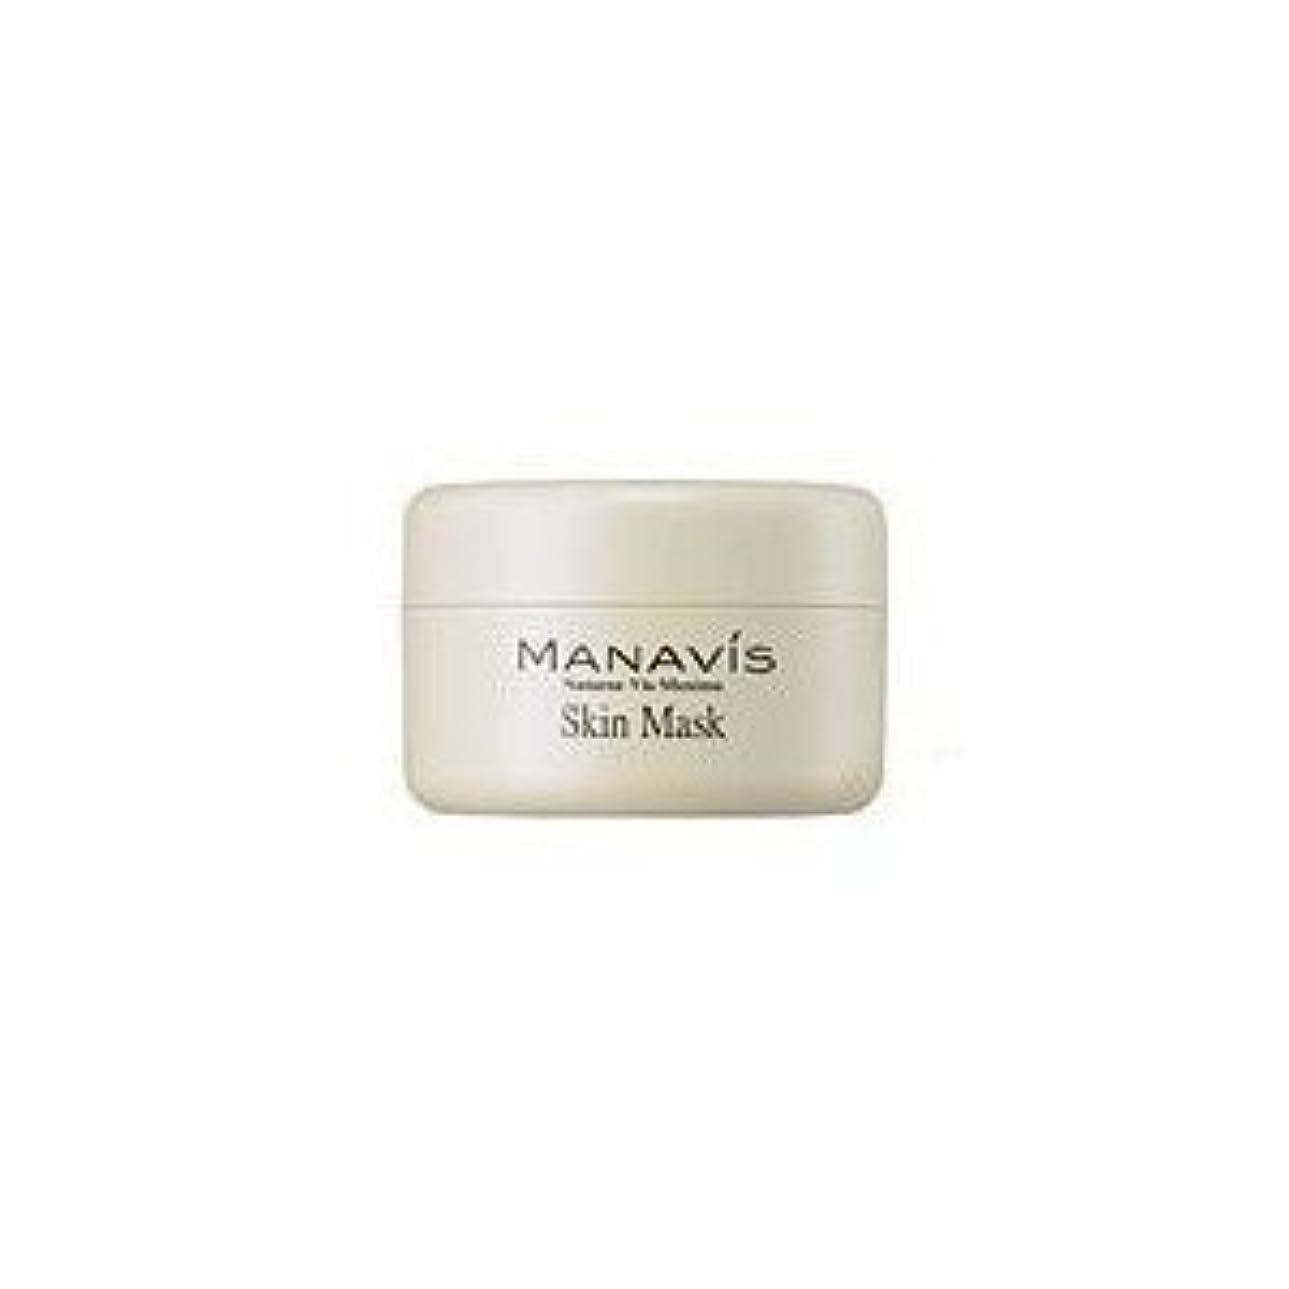 MANAVIS マナビス化粧品 薬用スキンマスク